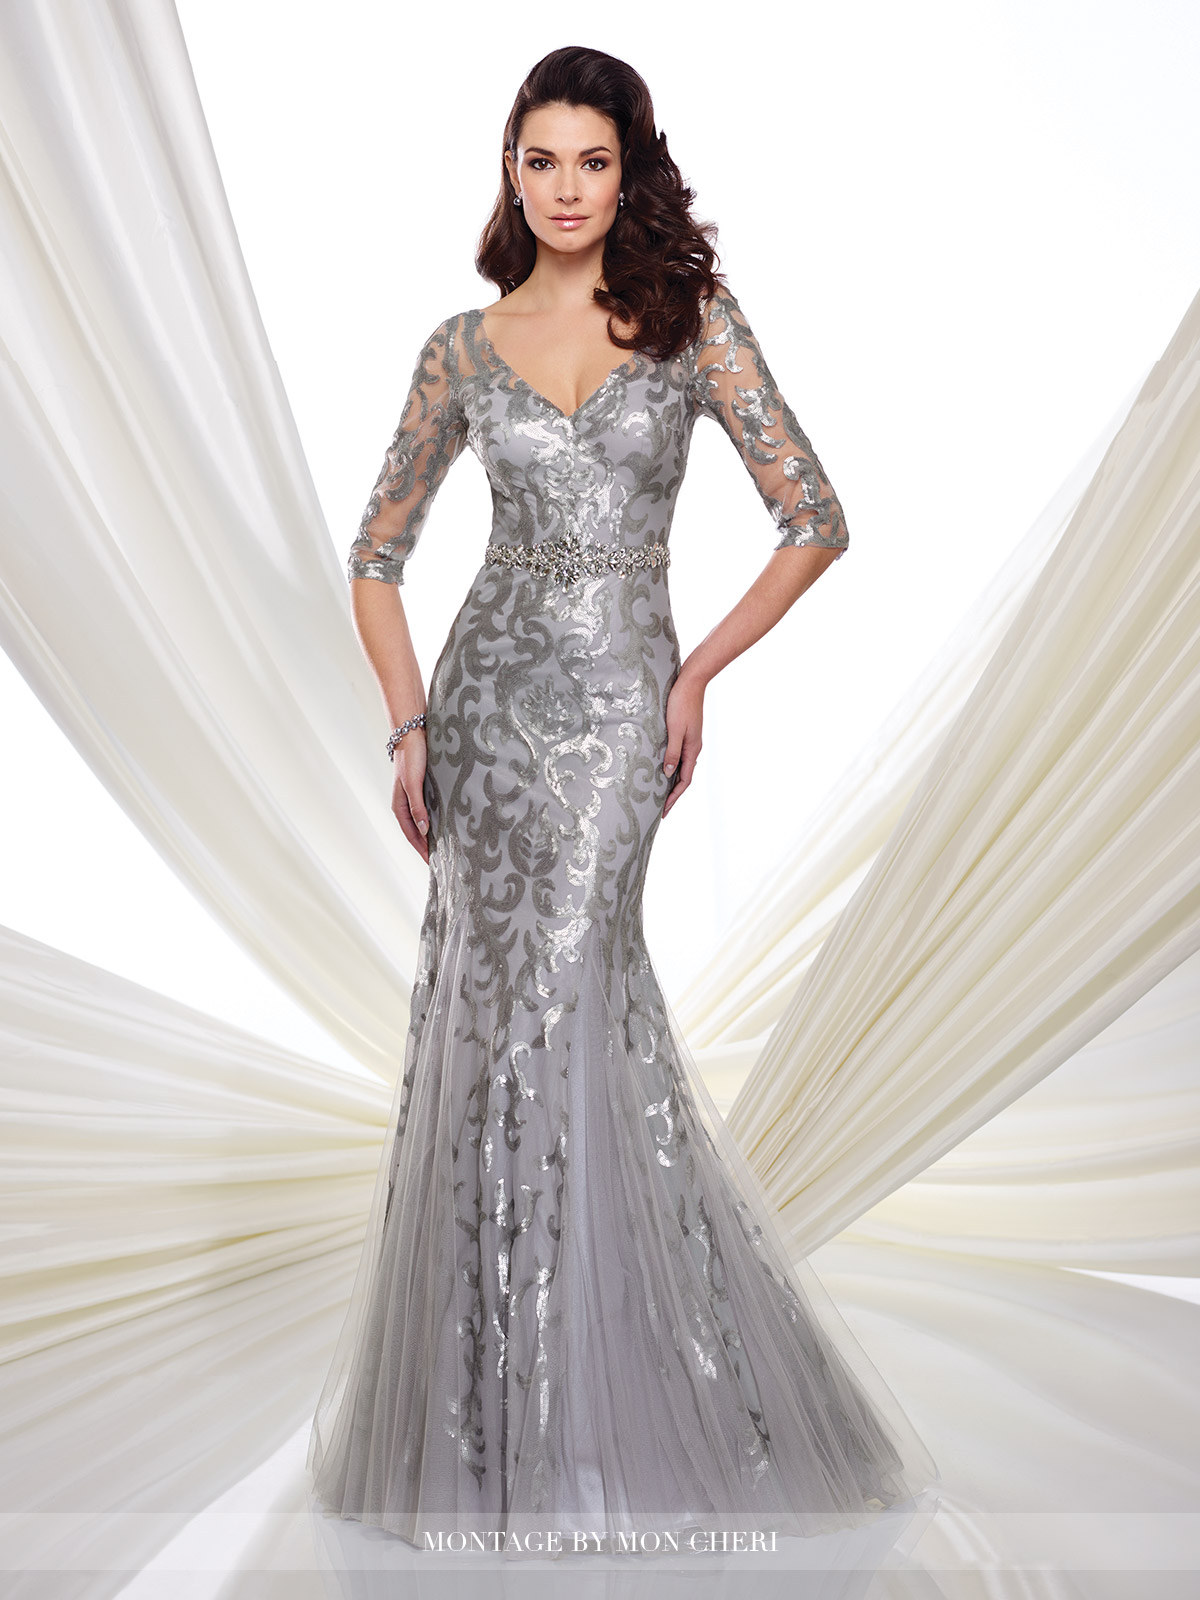 b96df77938d Couture Ivonne D Mother Of The Bride Dresses 2018 For Mon Cheri ...